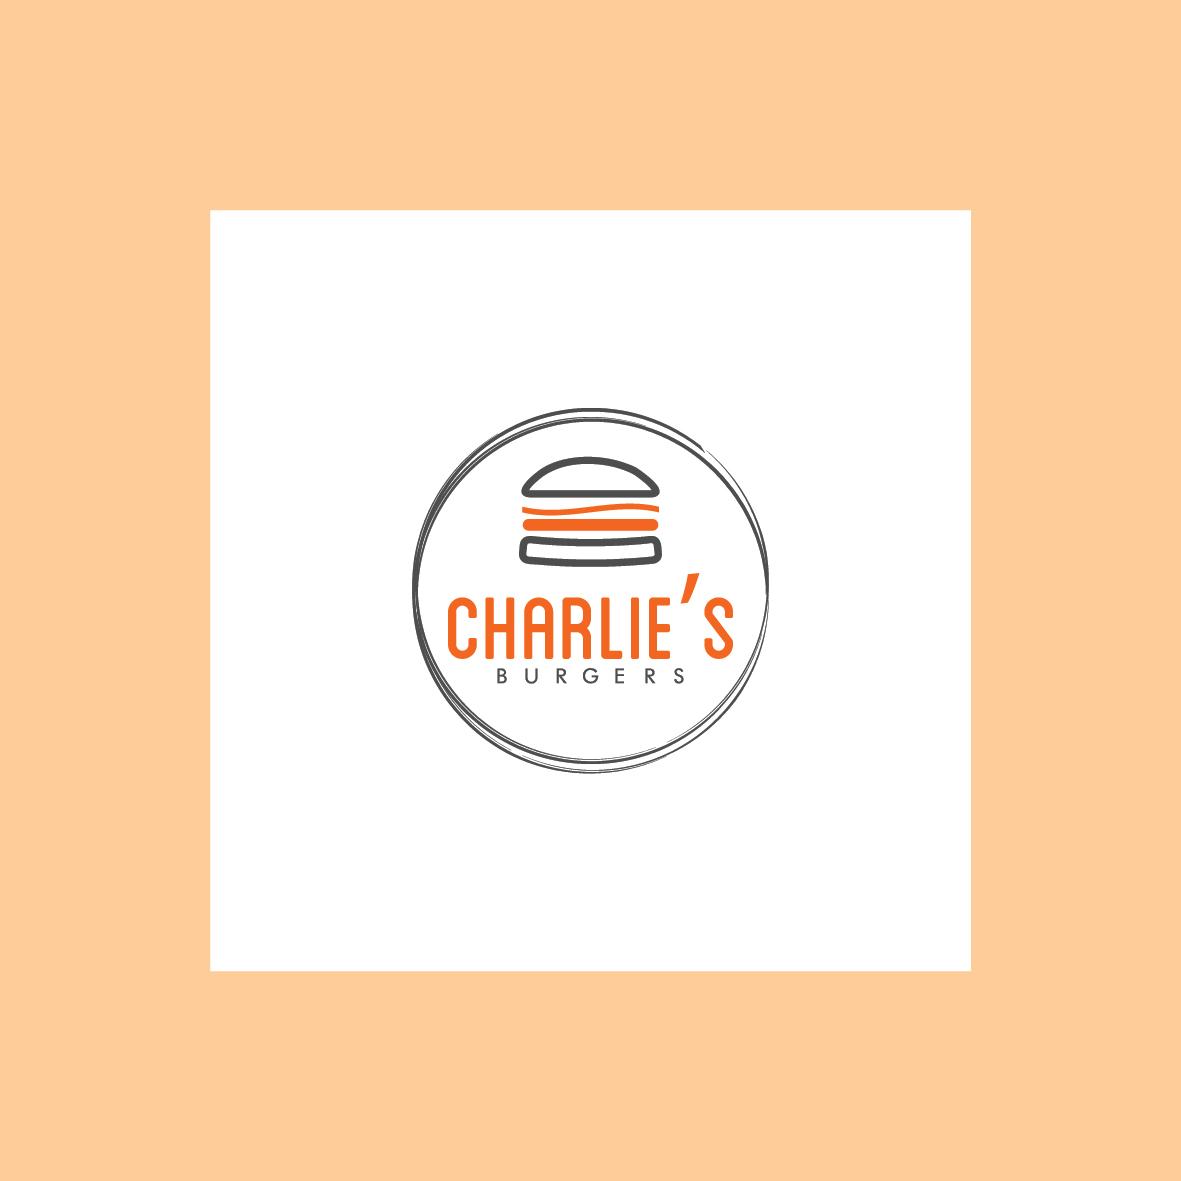 charlies's burger logo pub grafica salerno